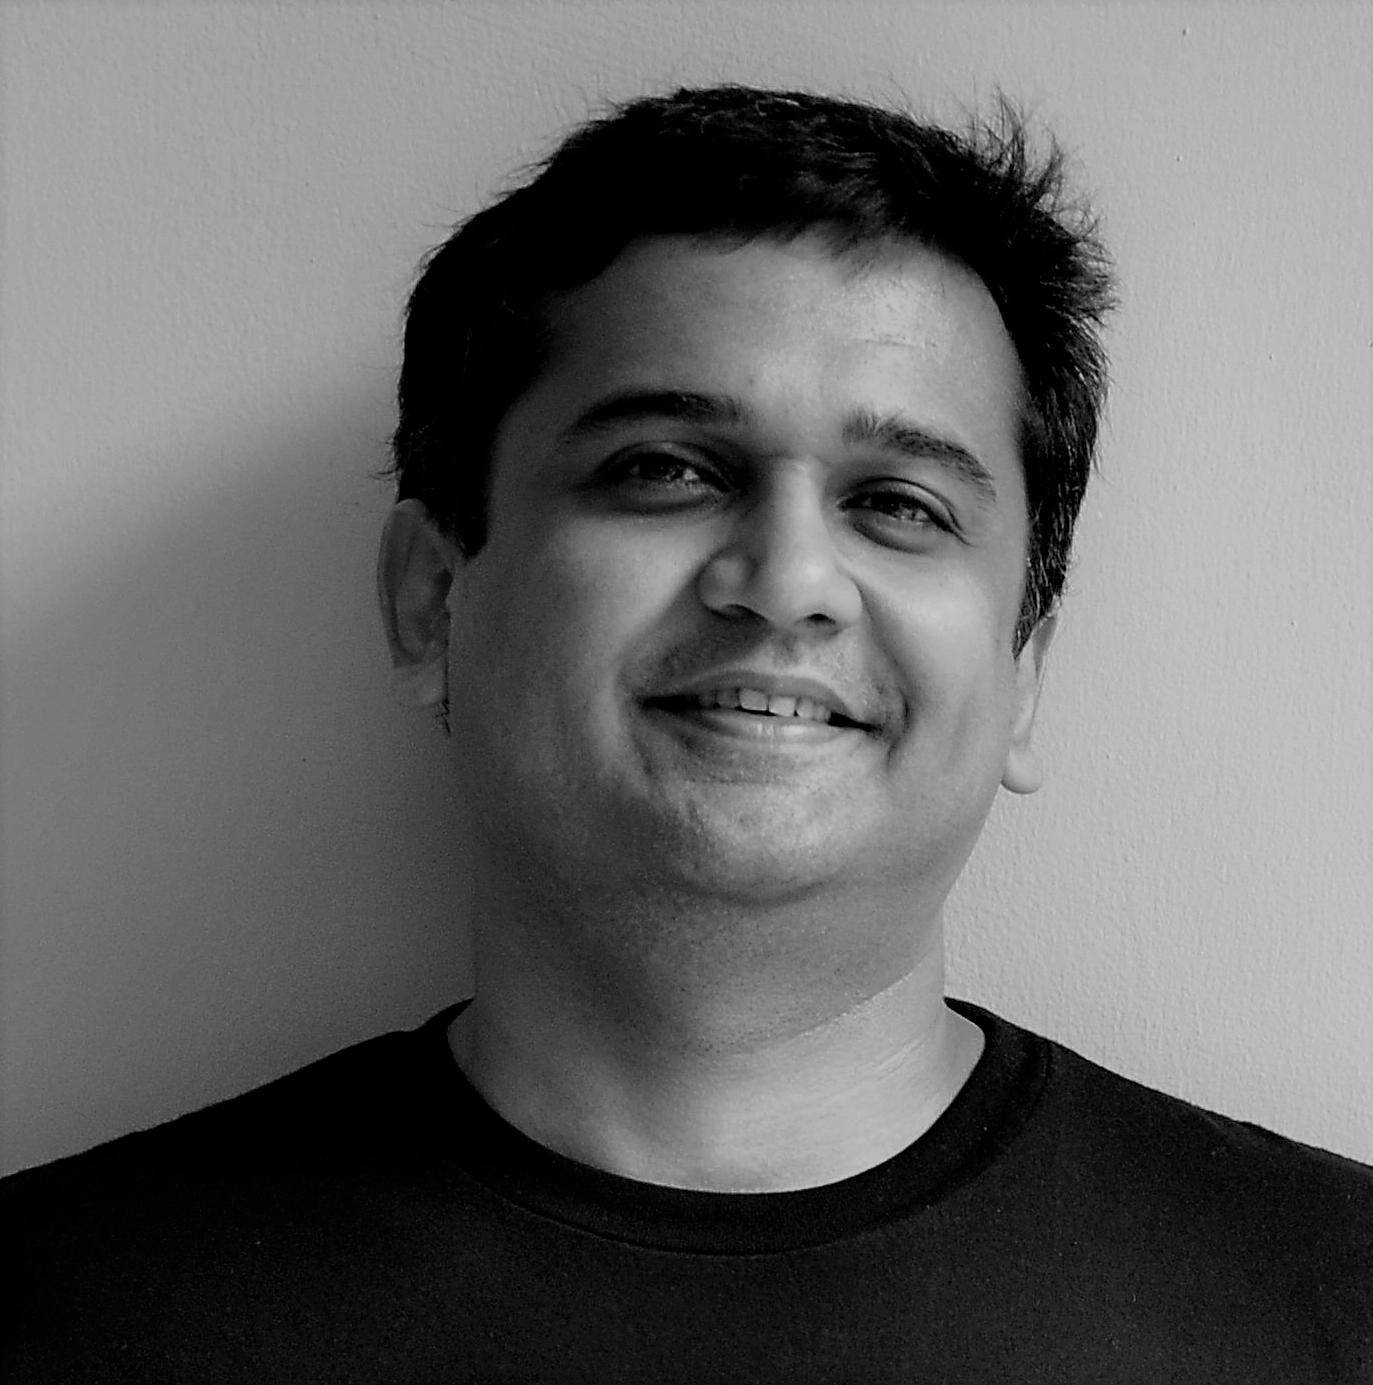 Alok Kejriwal